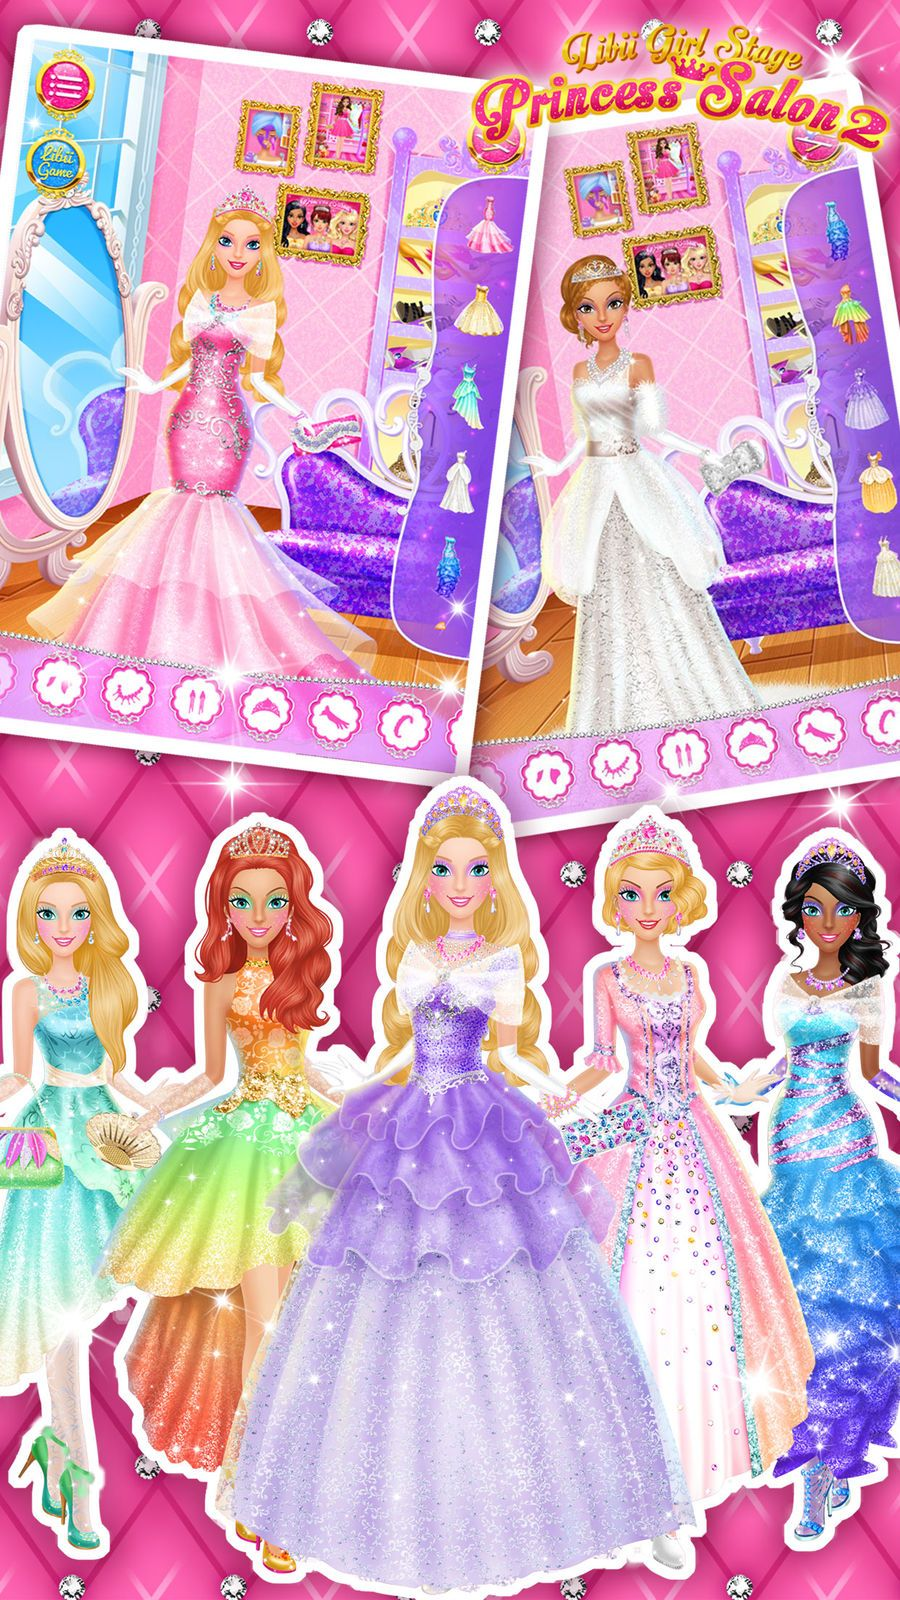 Princess Salon 2 Makeup Dressup Spa And Makeover Girls Beauty Salon Games Libii Games Beauty Family Princess Games Beauty Salon Games Princess